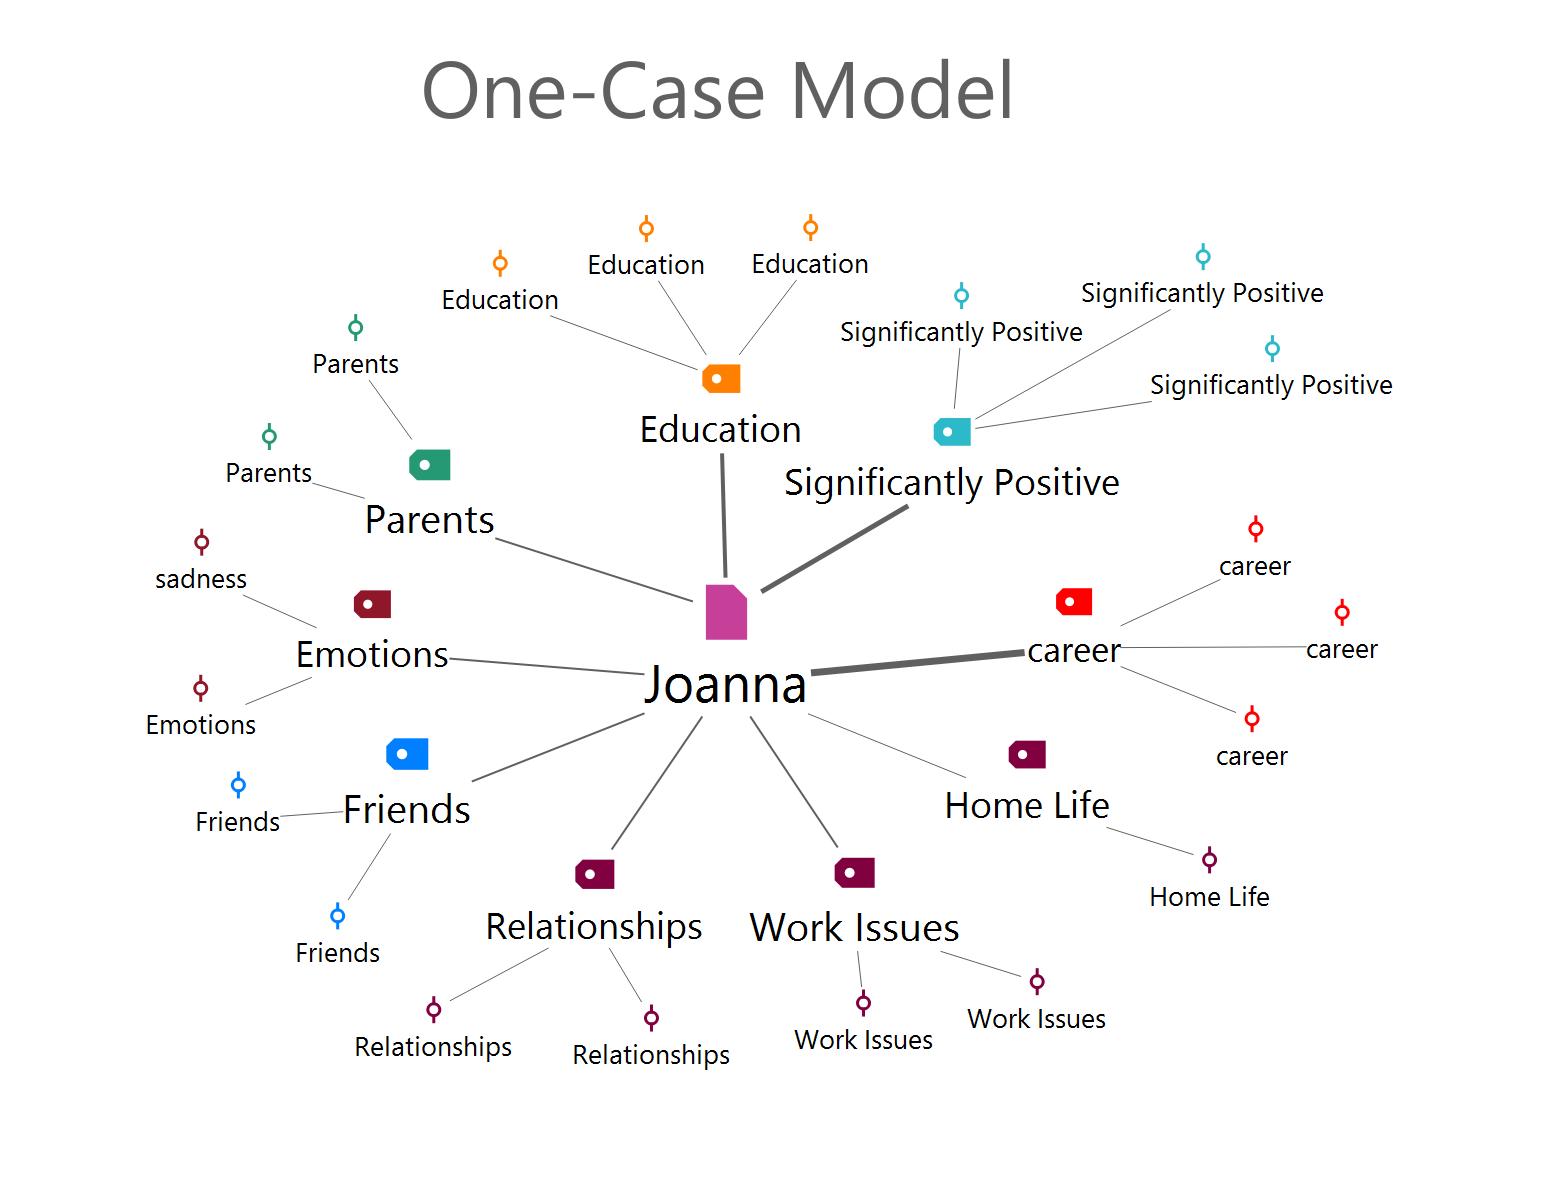 One-Case Model